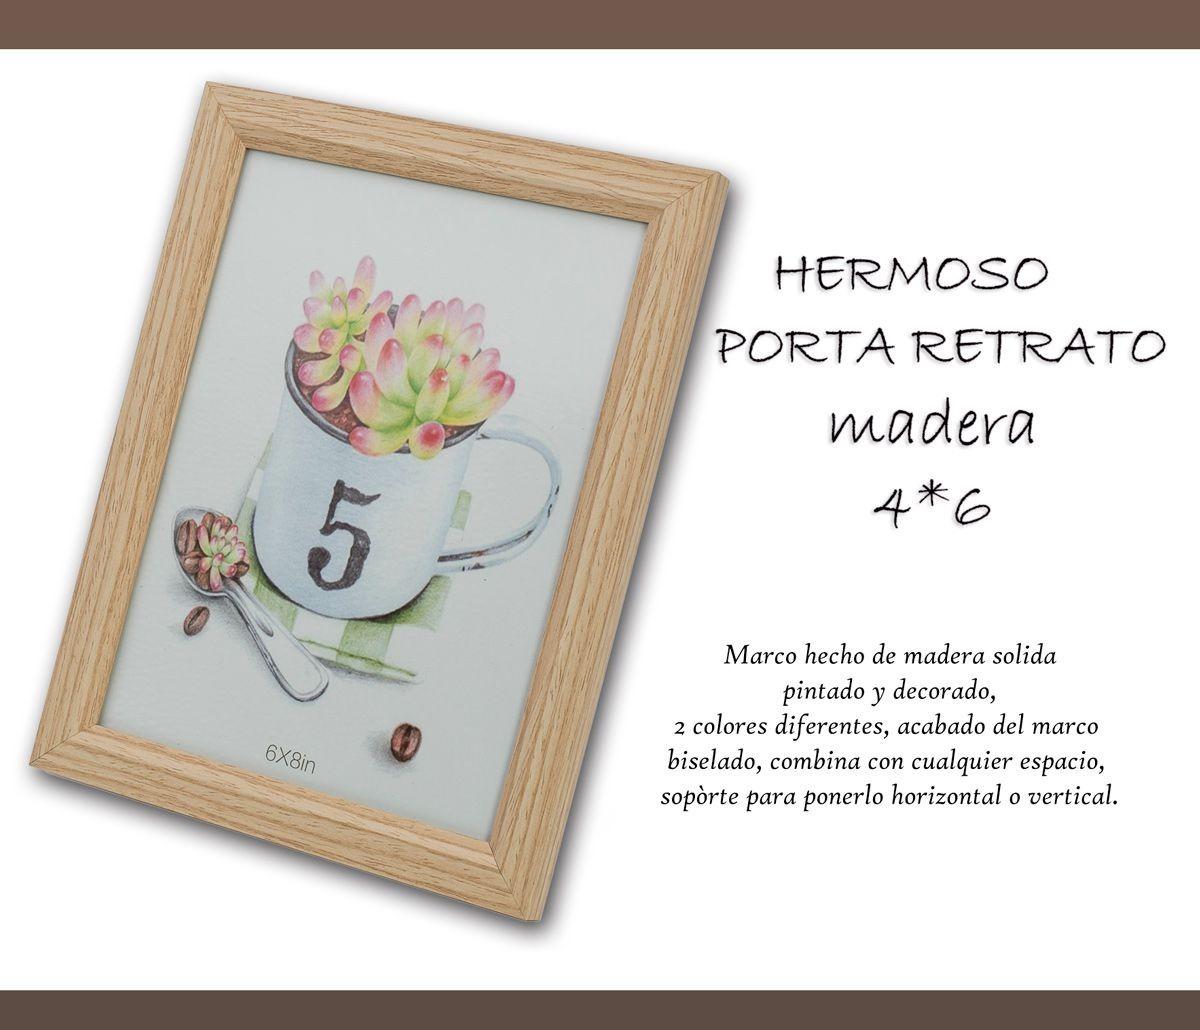 Dorable 4x6 Marco De Imagen Doble Cresta - Ideas Personalizadas de ...